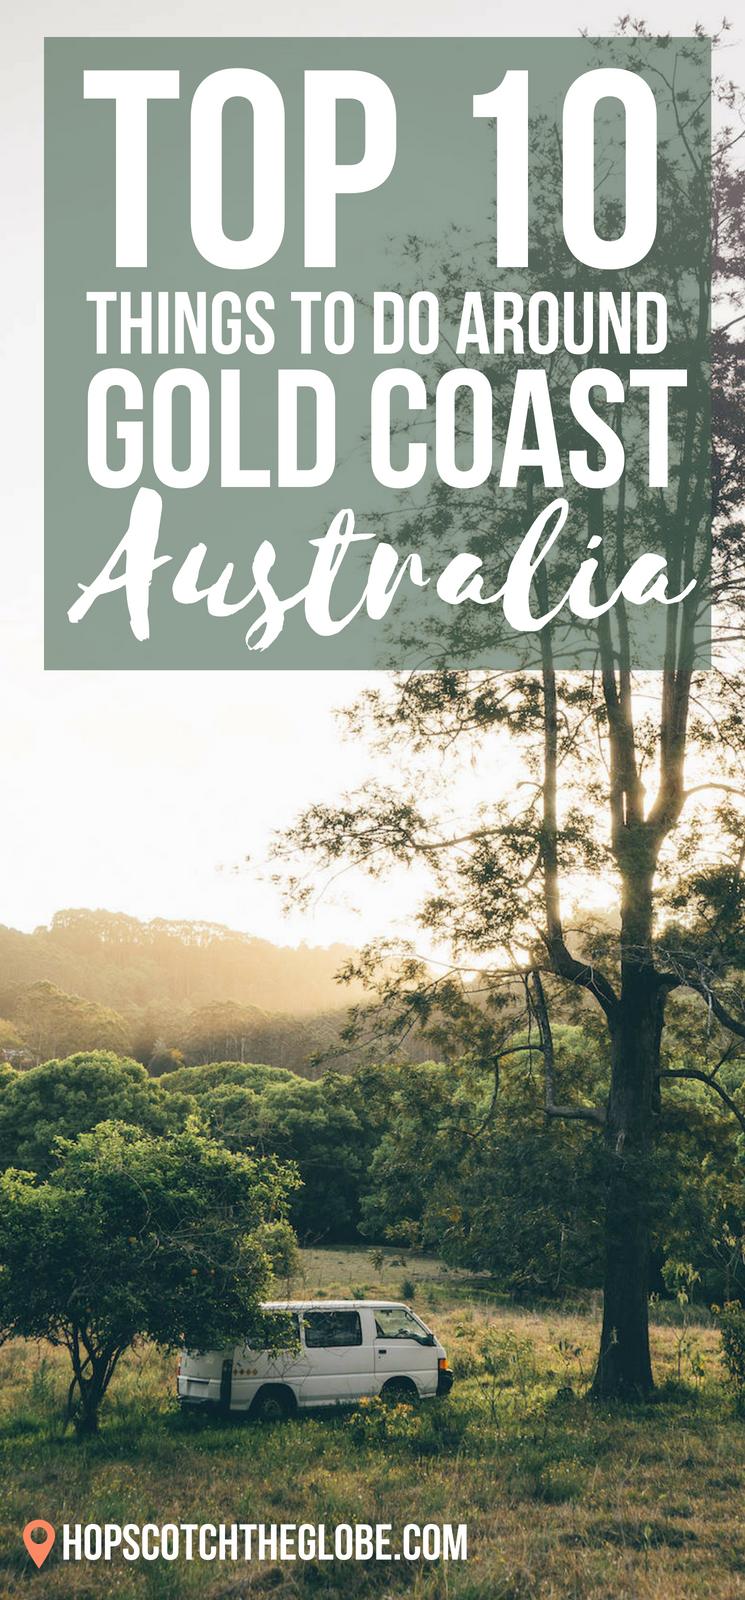 Top 10 GoldCoast Australia Pin _ HSG (1)